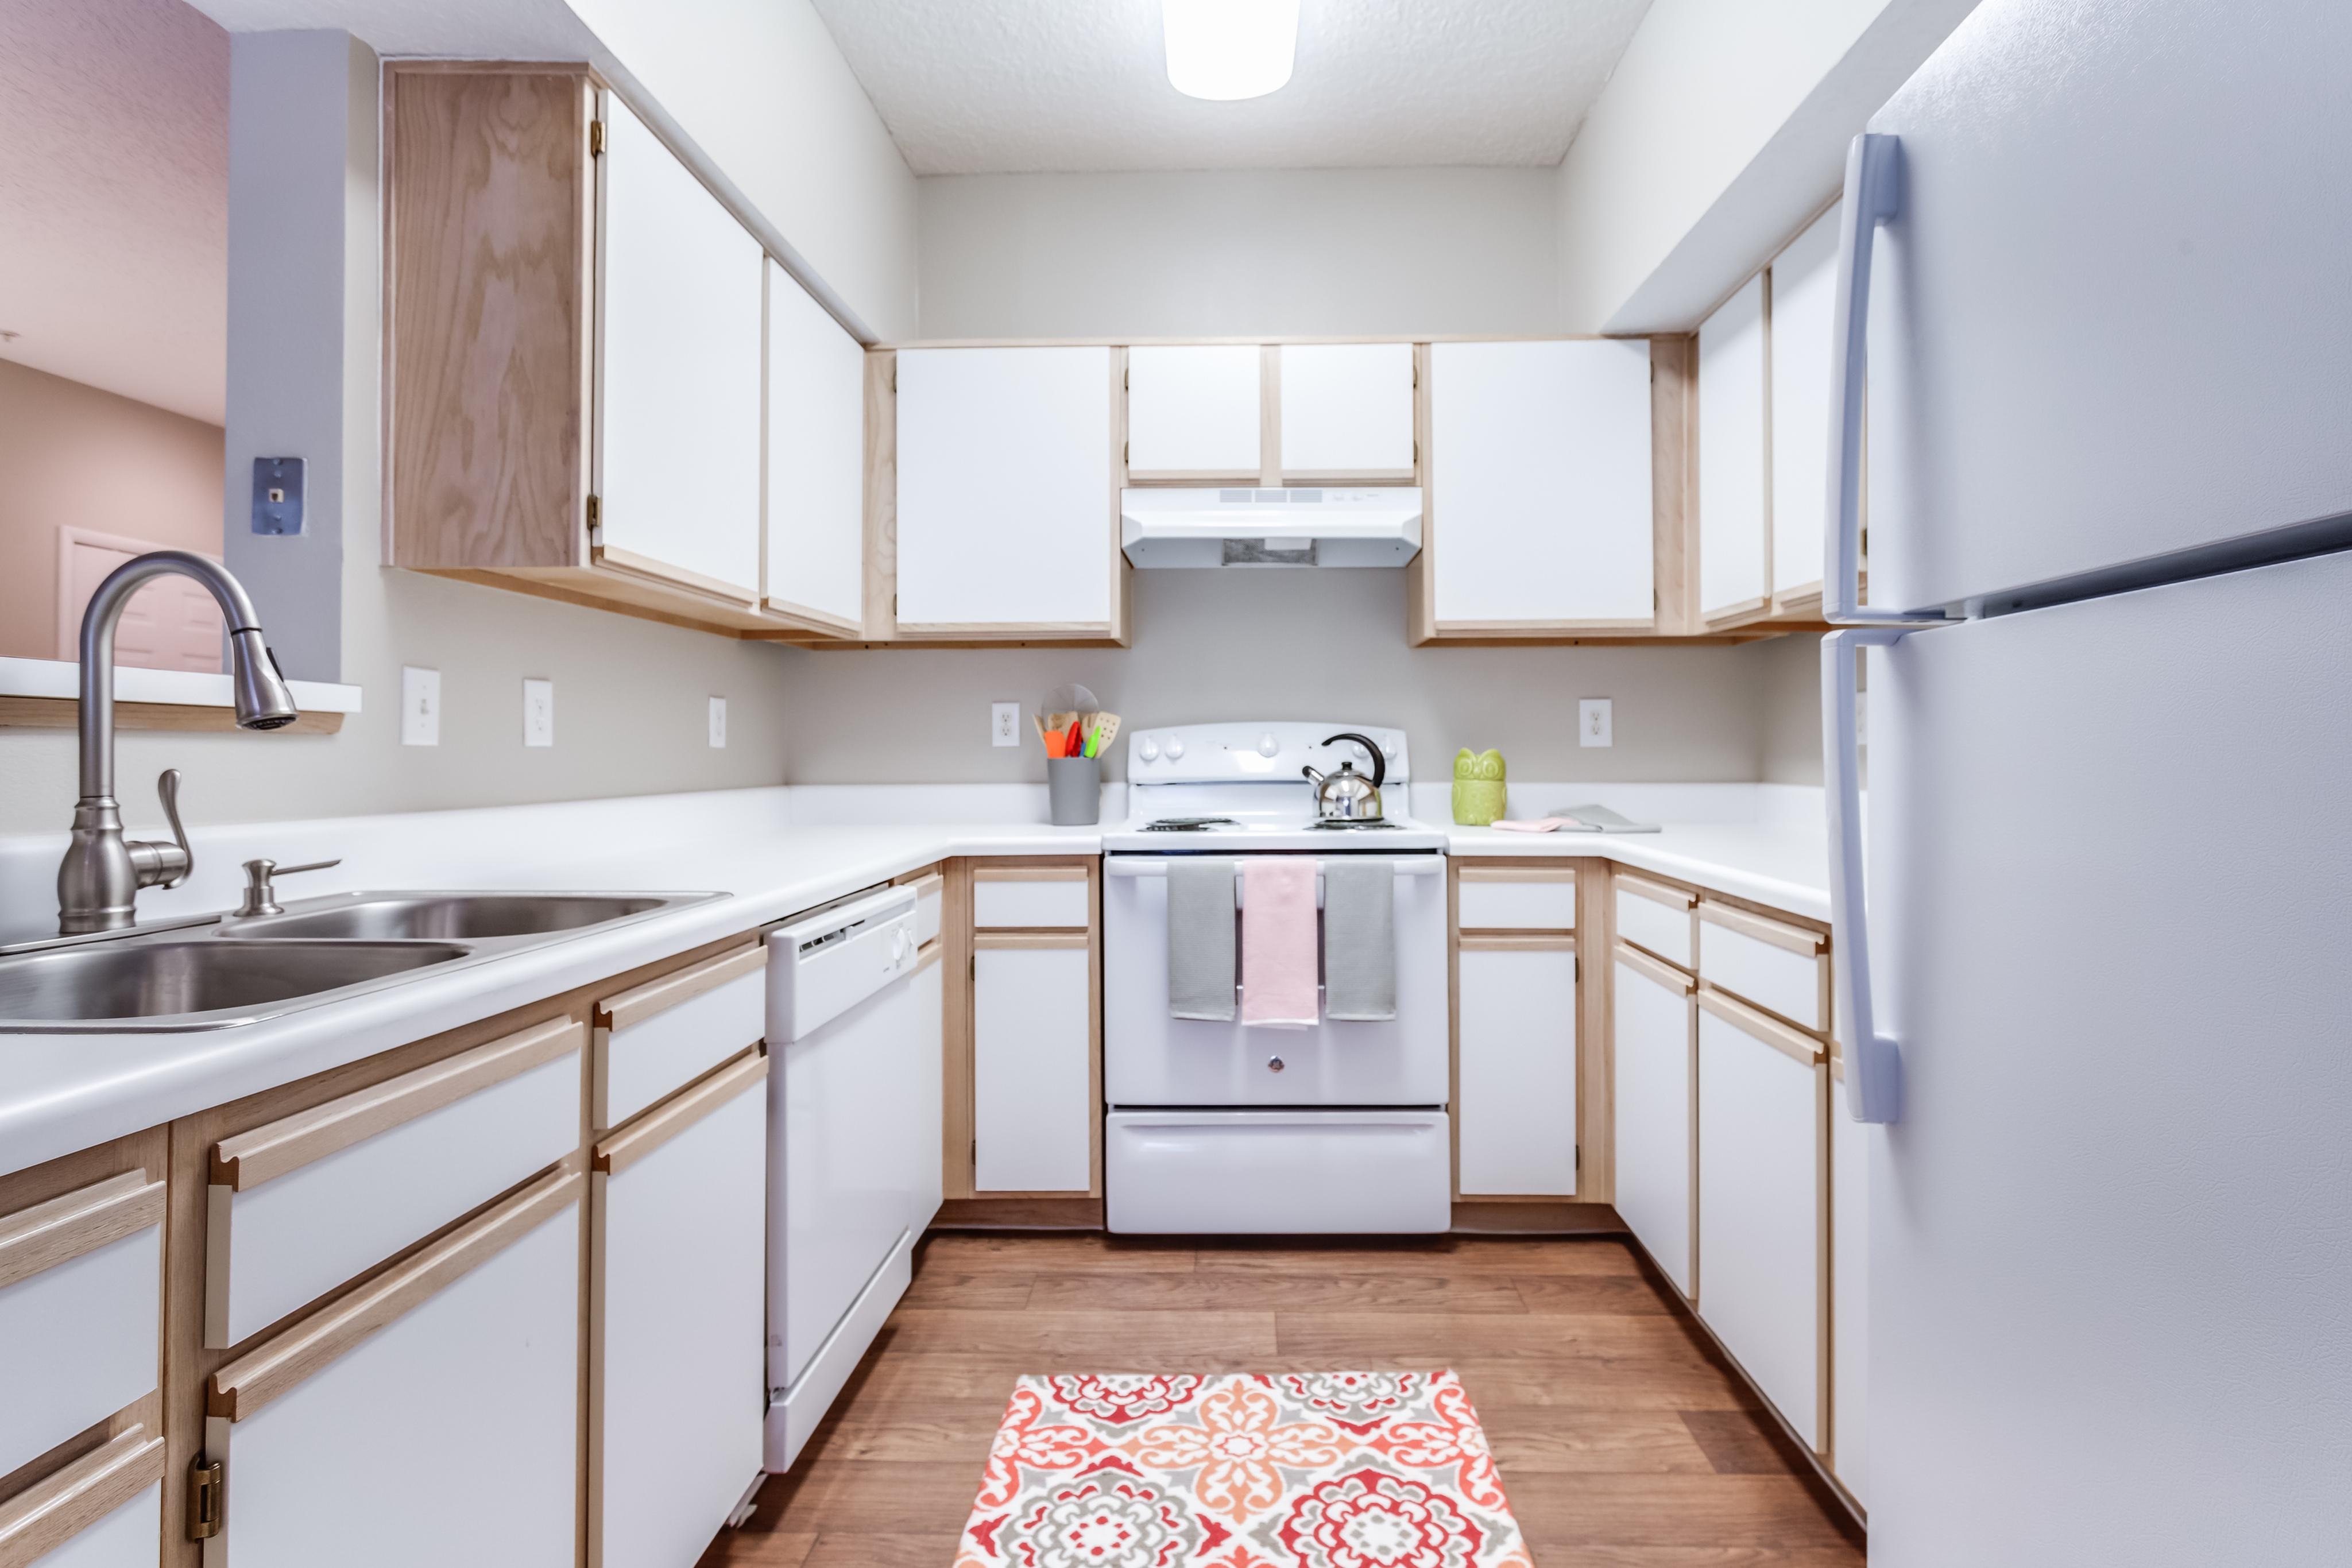 greystar charlotte in properties southline one apartments nc solis bedroom